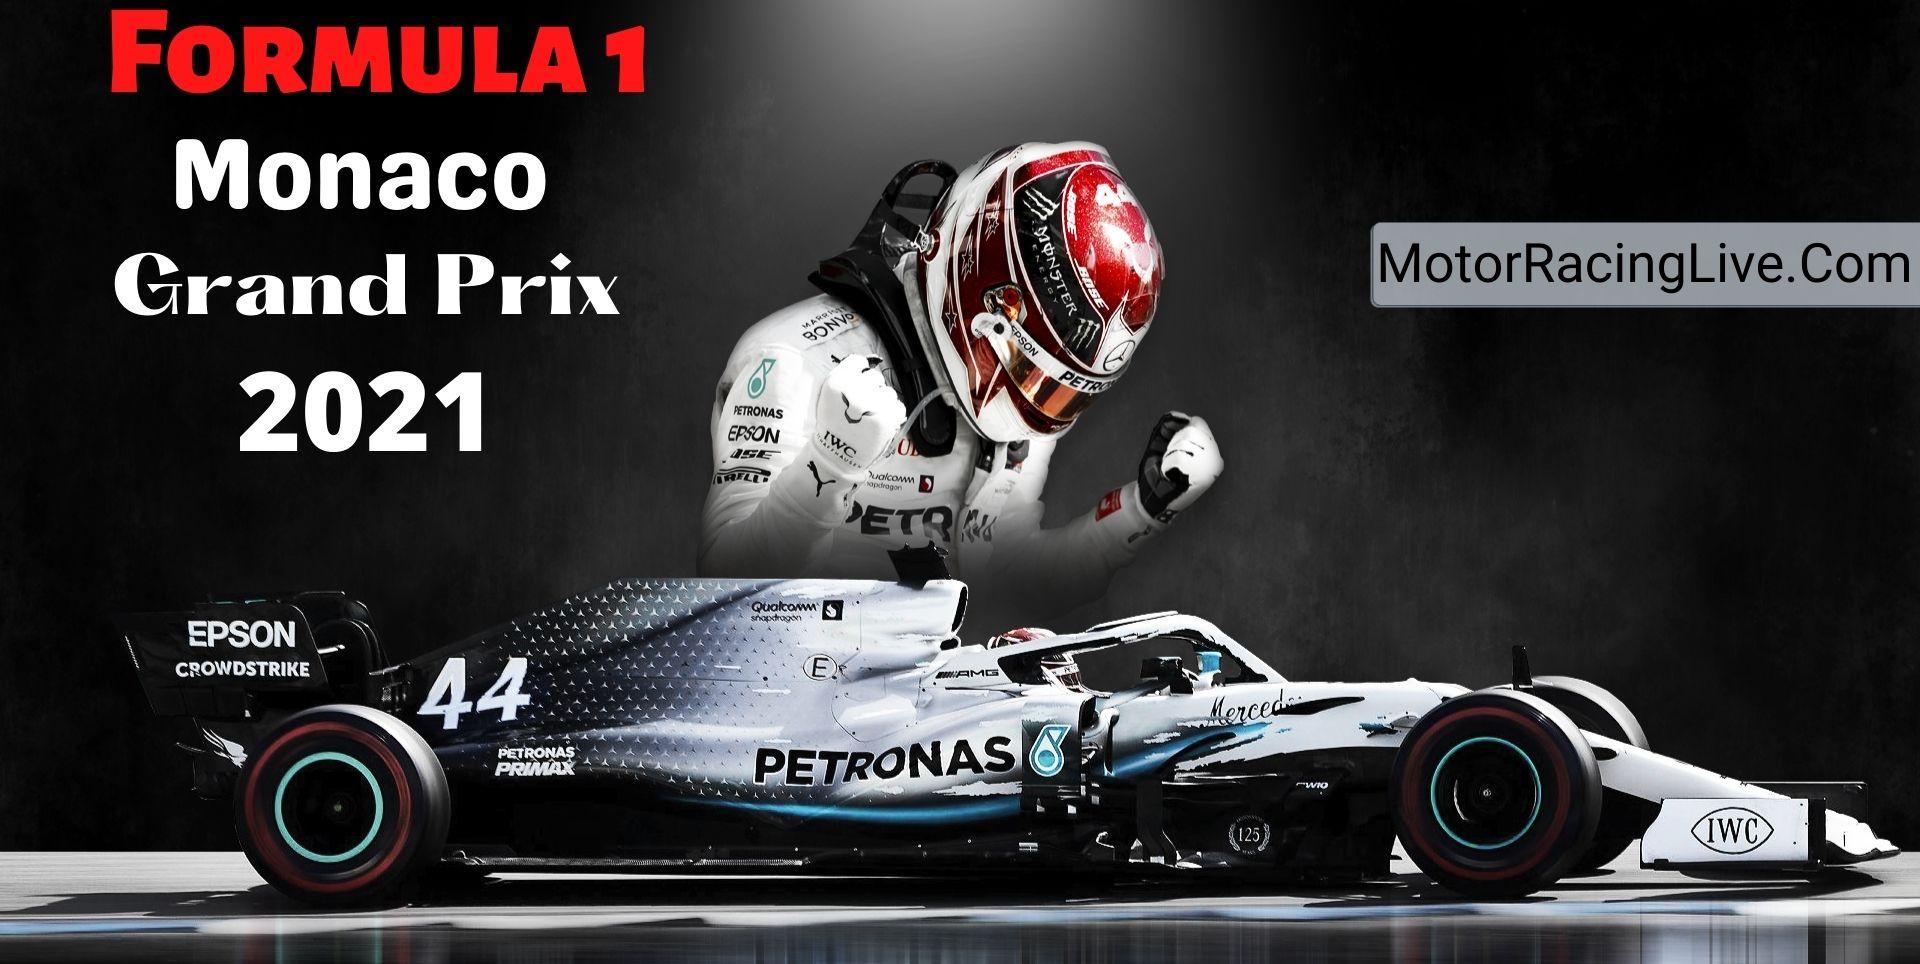 Monaco F1 Grand Prix Live Streaming 2021 | Full Race Replay